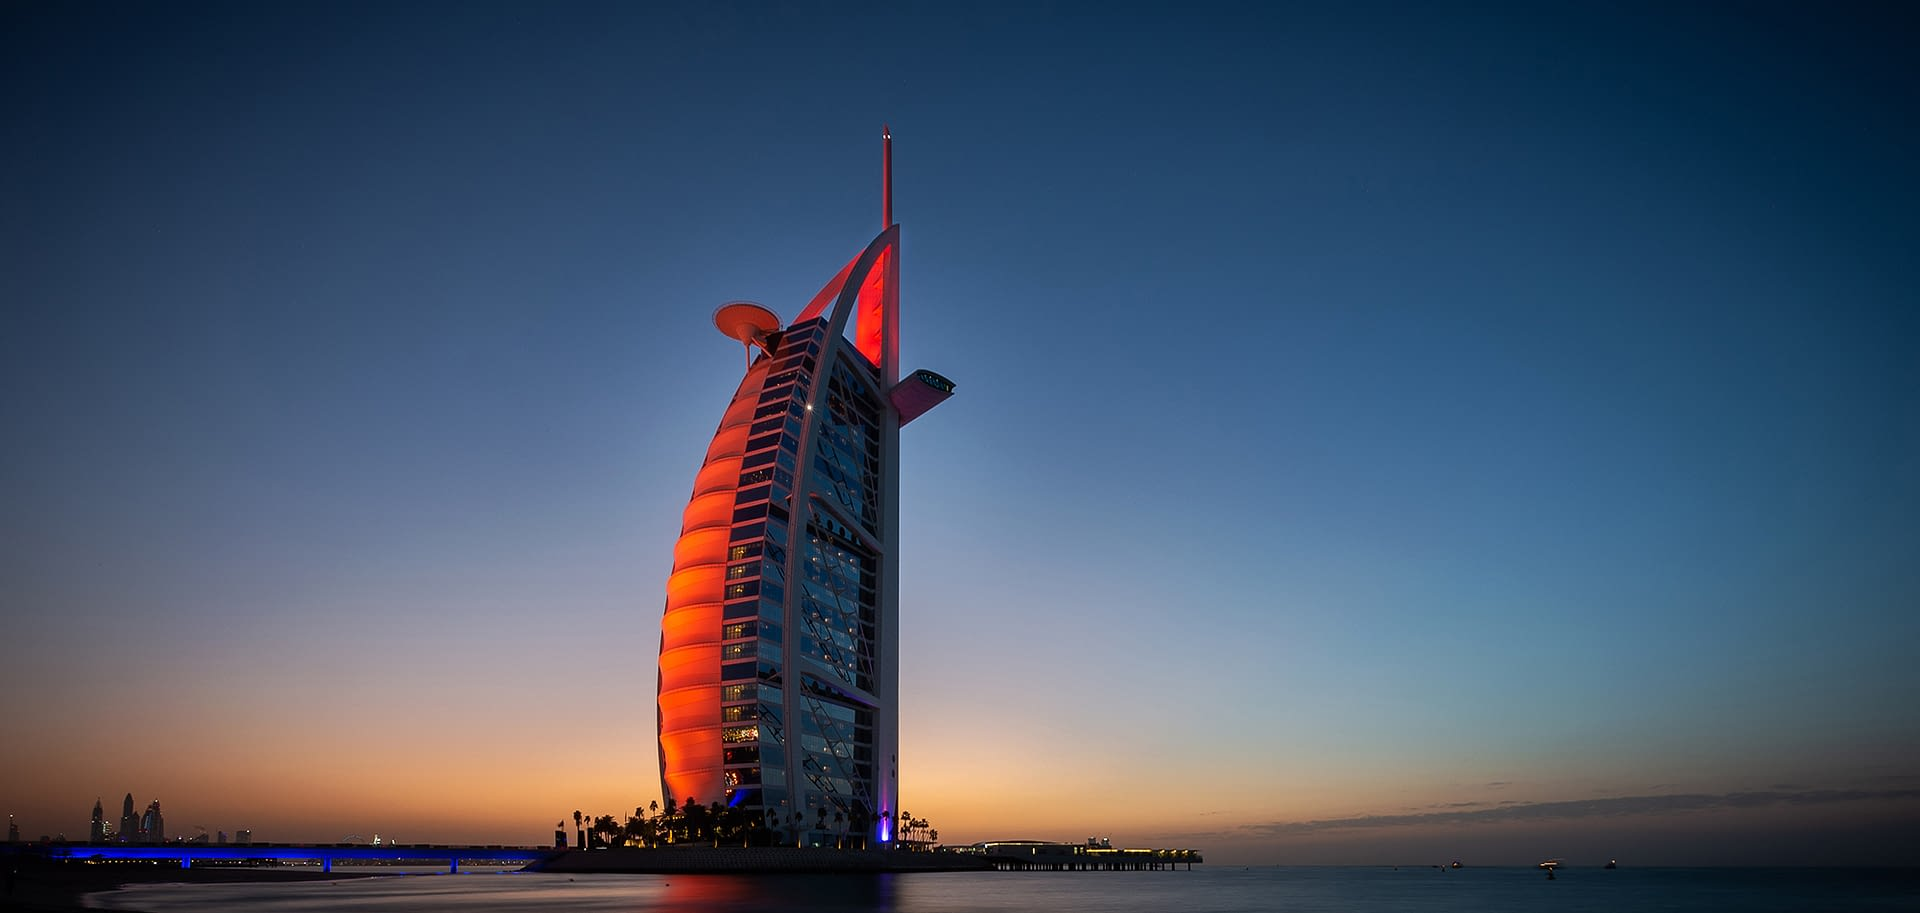 Burj Al Arab, Dubai, United Arab Emirates by Jonathan Walley